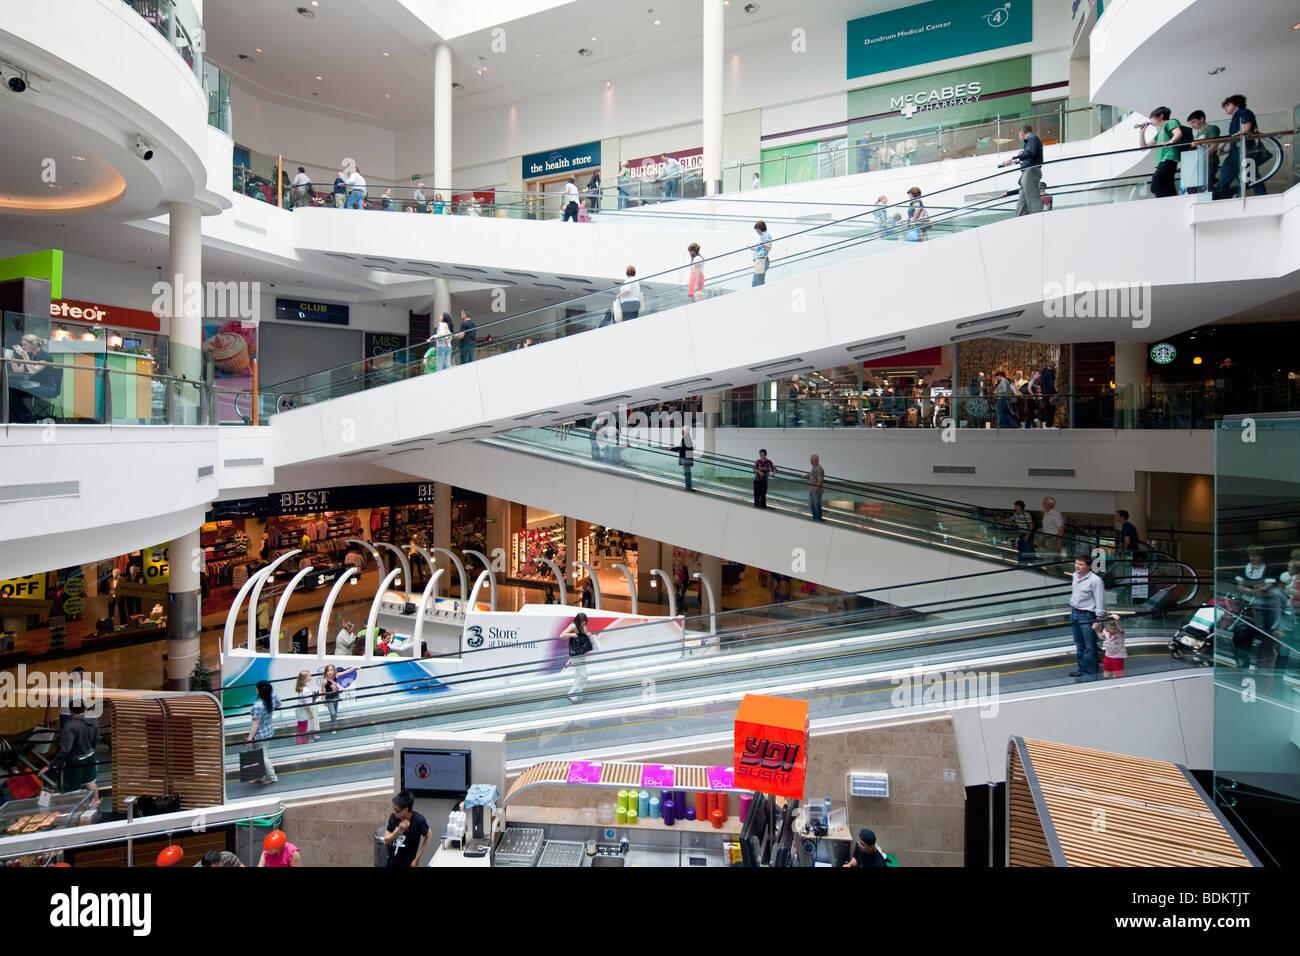 Dundrum Shopping Centre, Dublin, Ireland - Stock Image